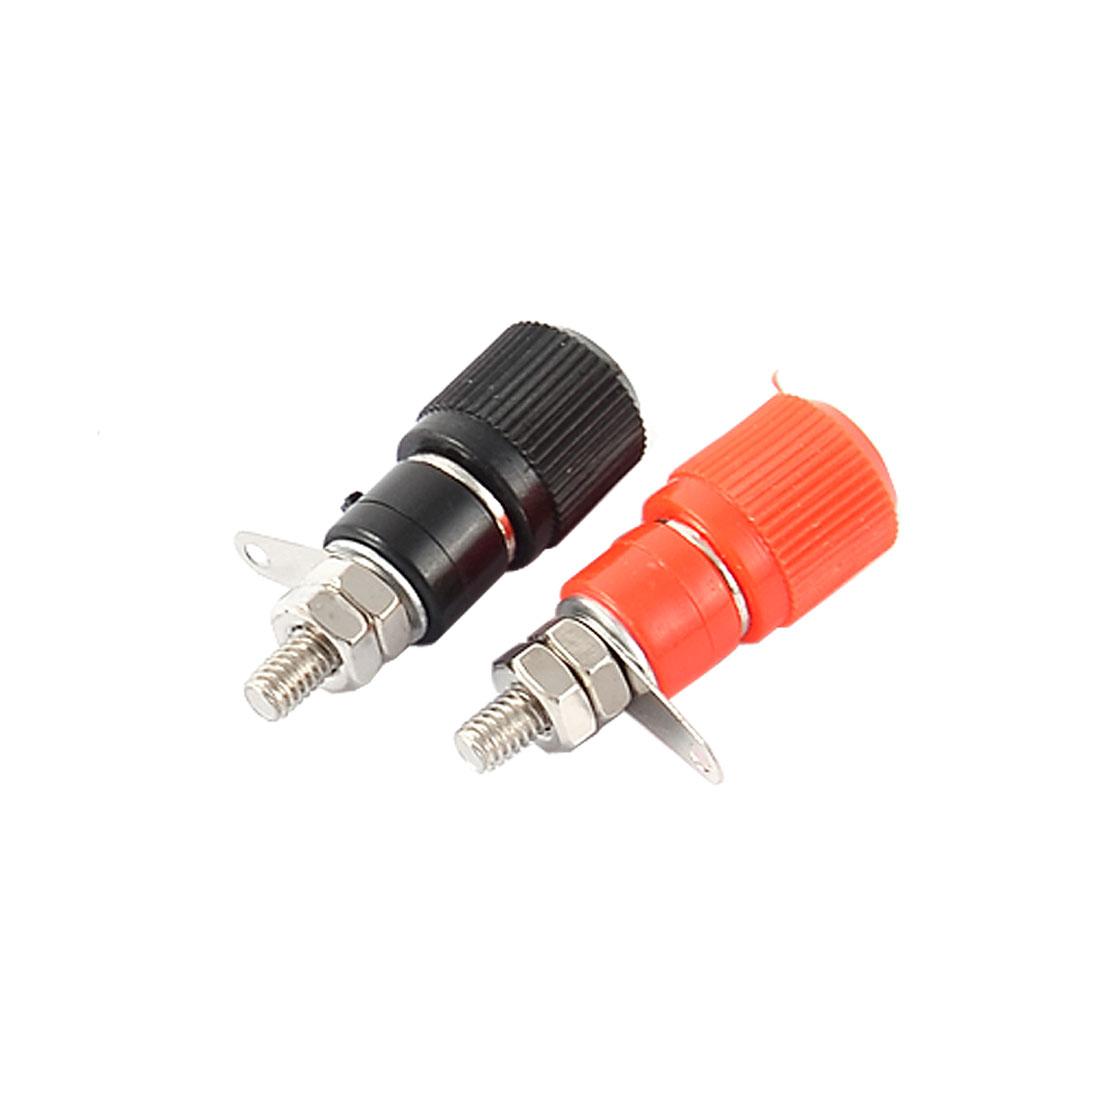 2pcs Black Red Speaker Cable Terminal Amplifier 4mm Banana Connector Socket Binding Post